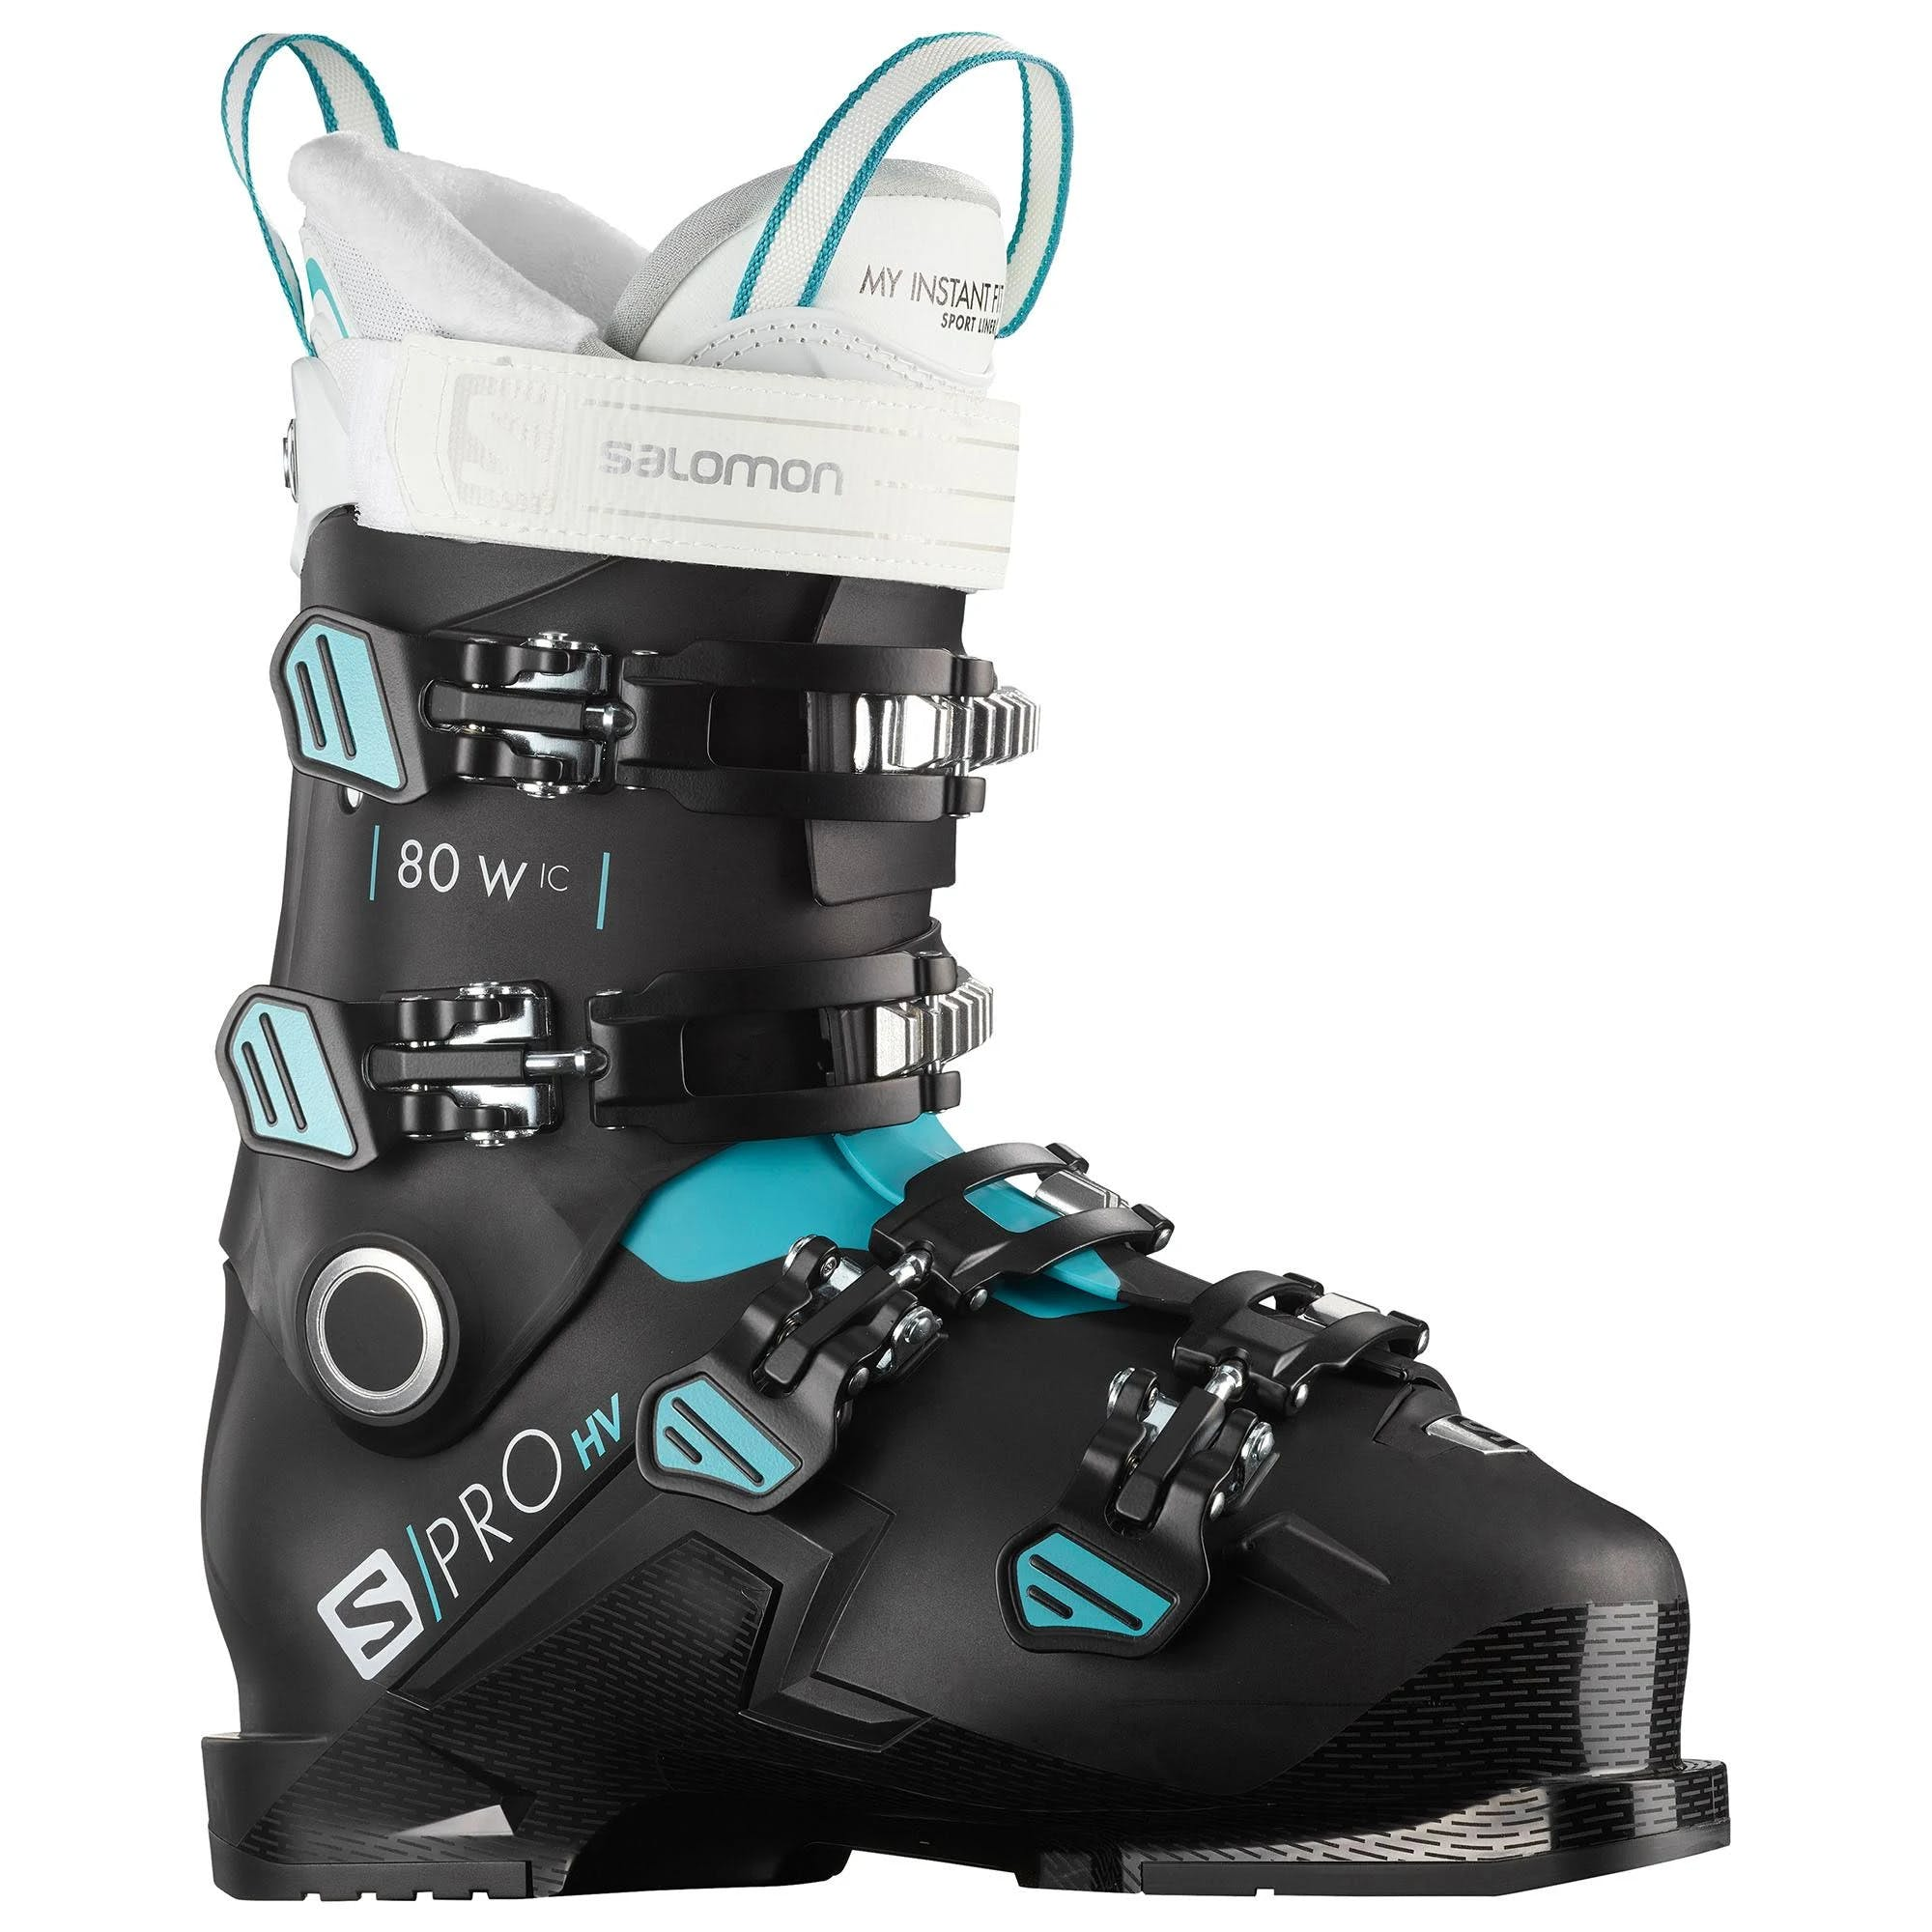 Salomon S/pro HV 80 Ic Women's Ski Boots Black-scuba Blue-white 26.5